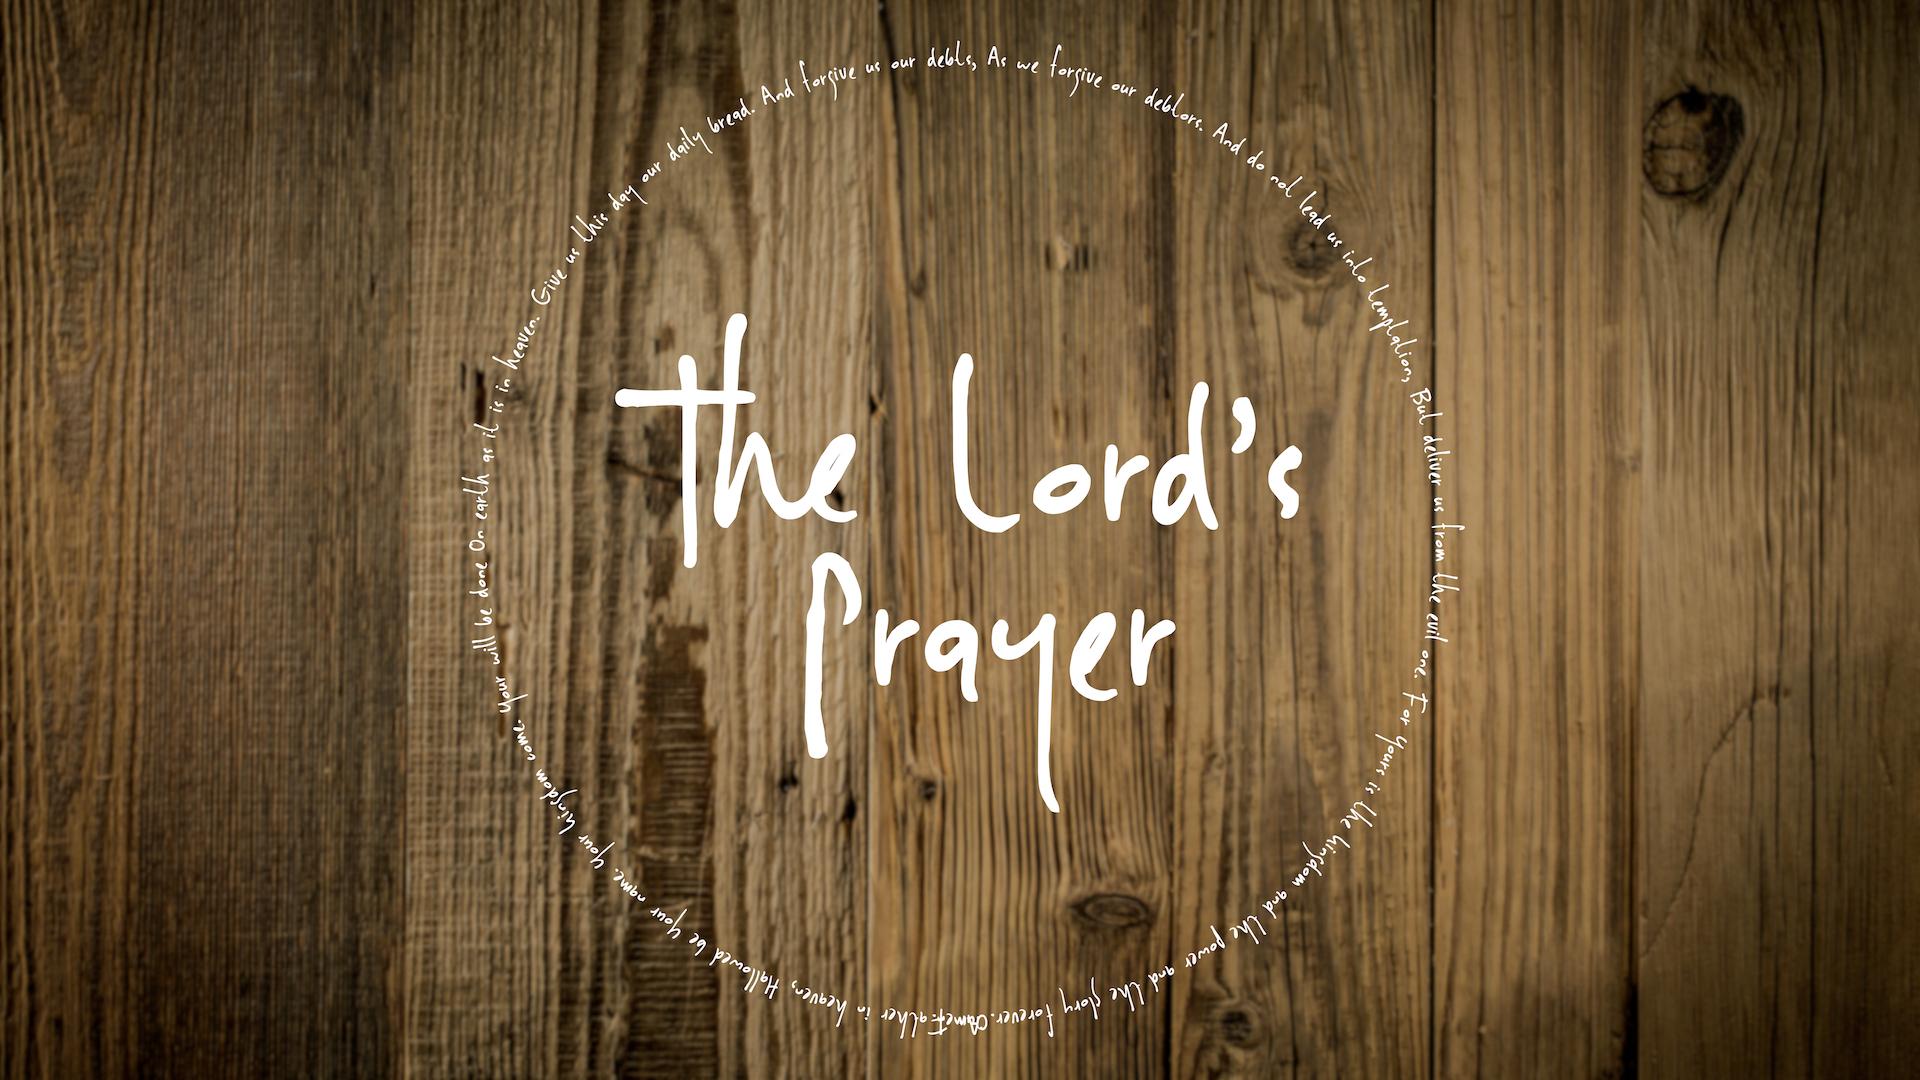 the lord's prayer logo.jpeg